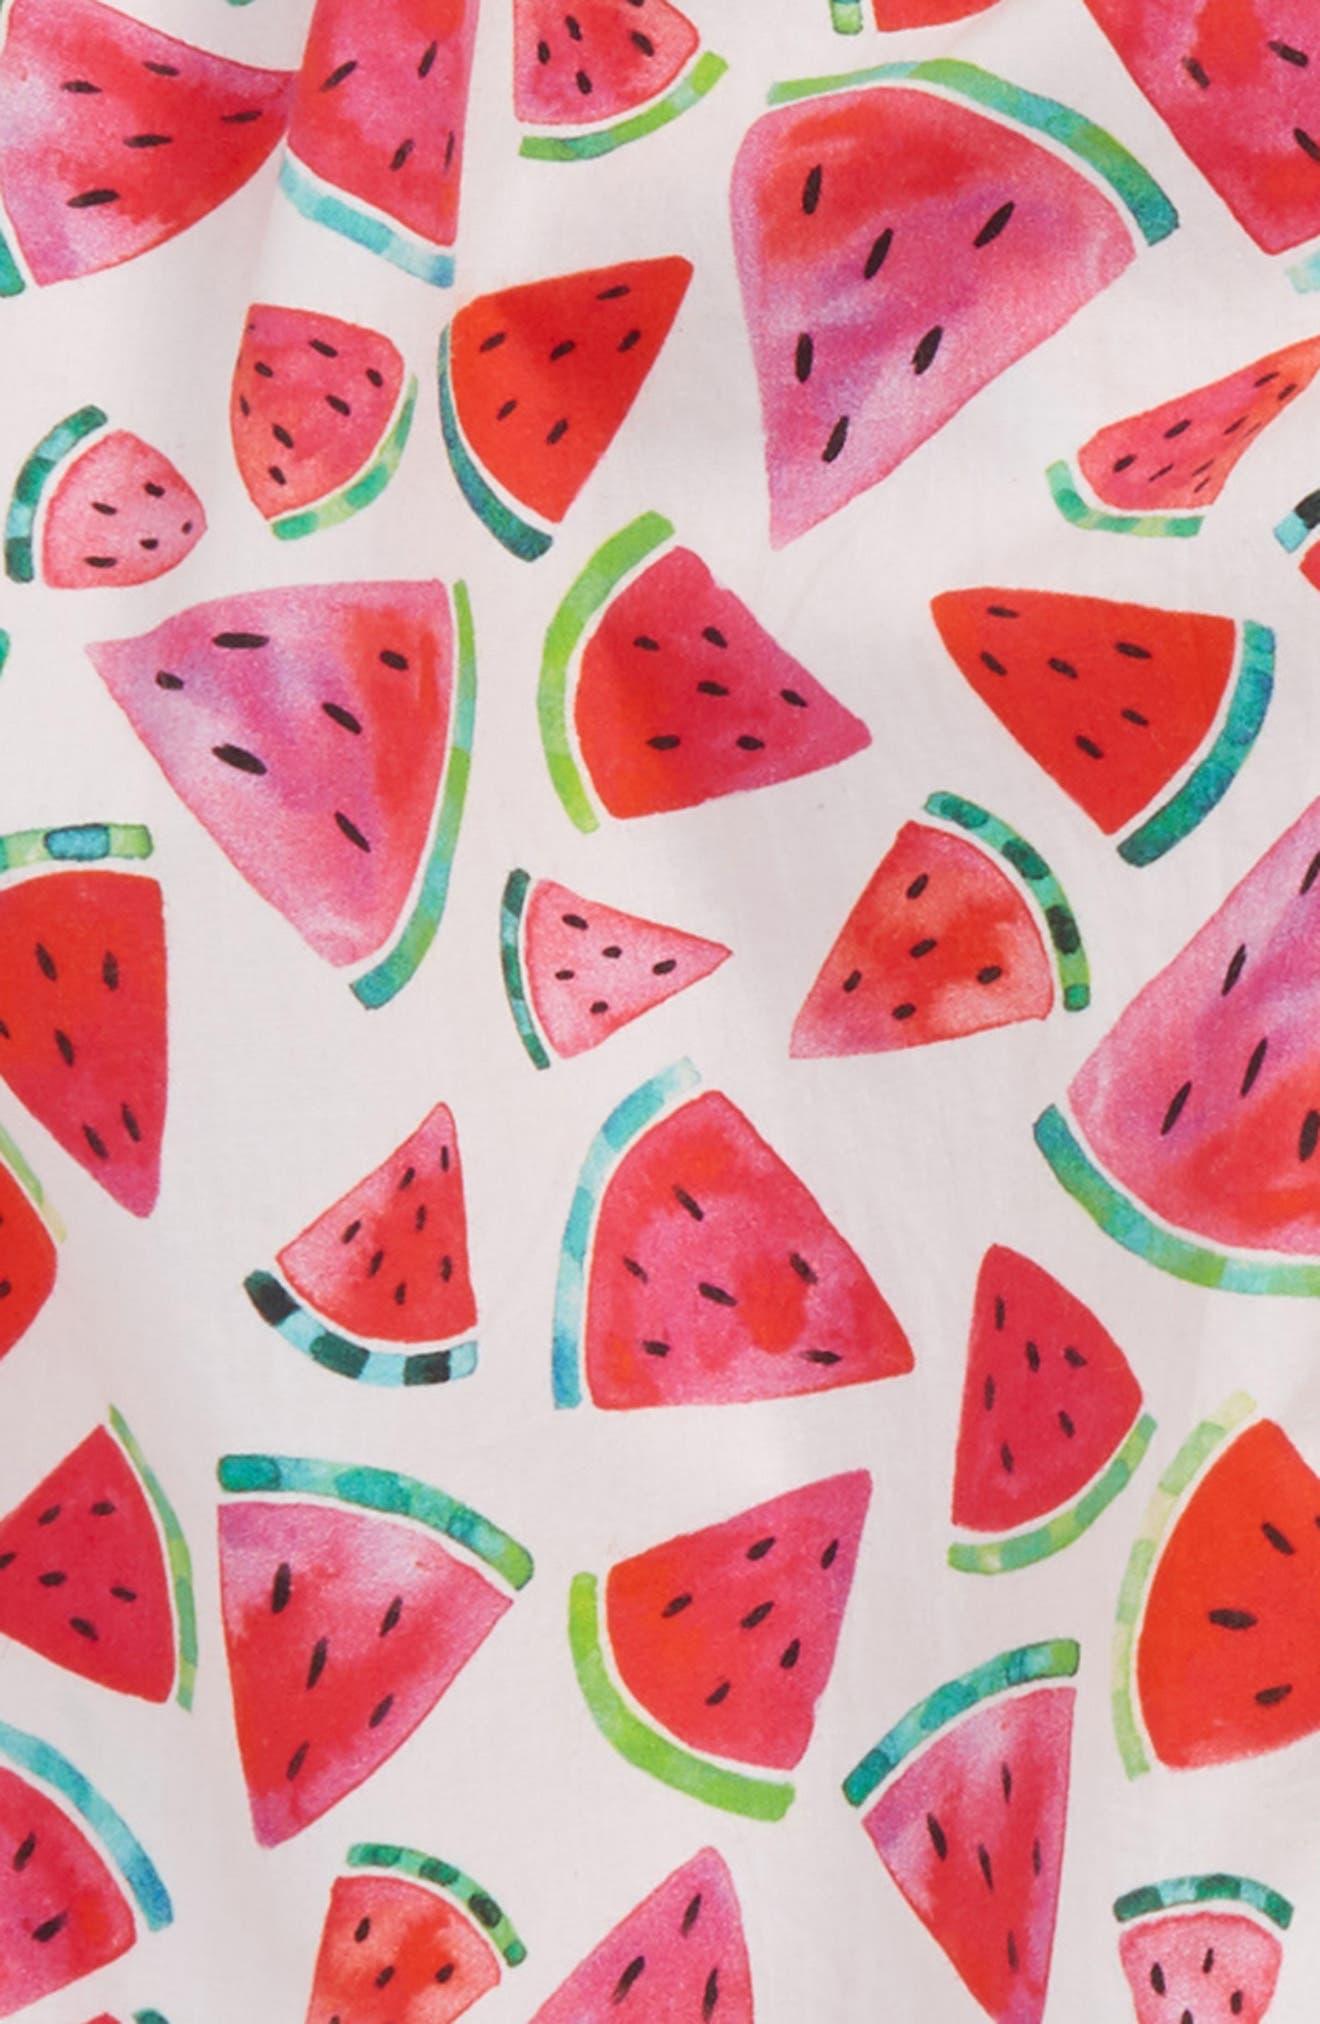 Watermelon Print Dress,                             Alternate thumbnail 2, color,                             100